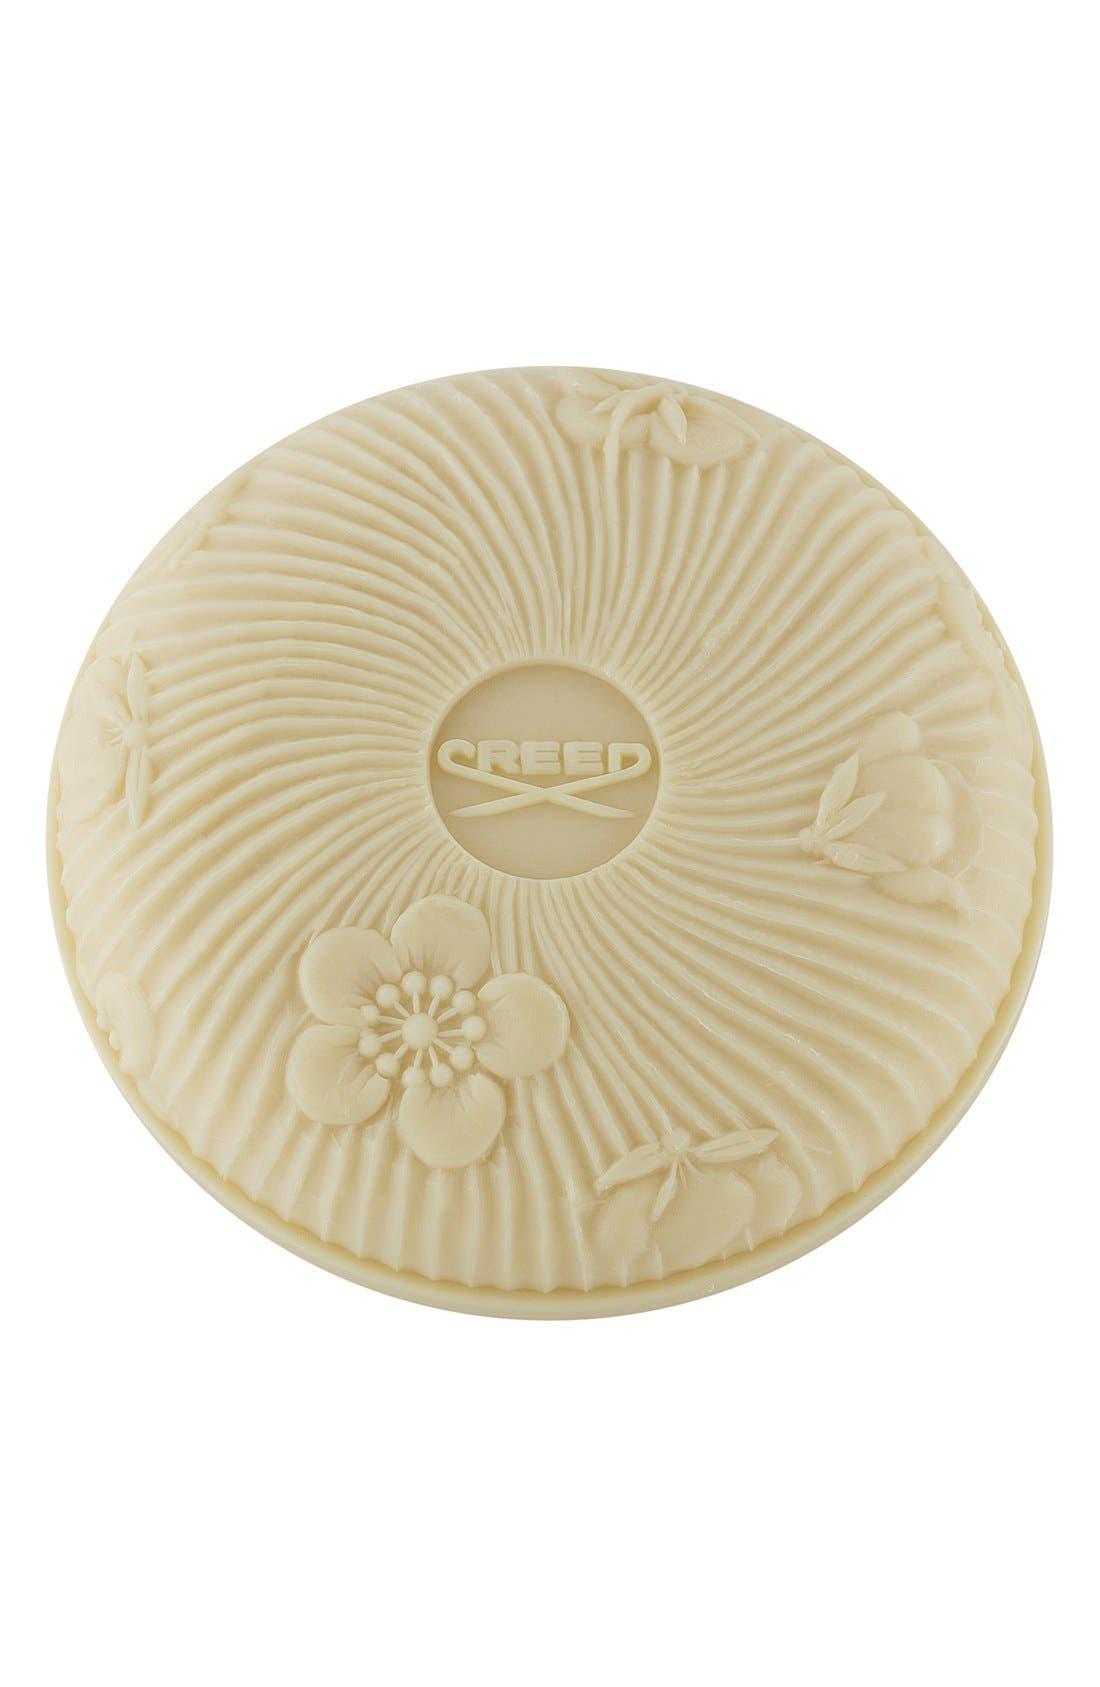 Creed 'Virgin Island Water' Soap